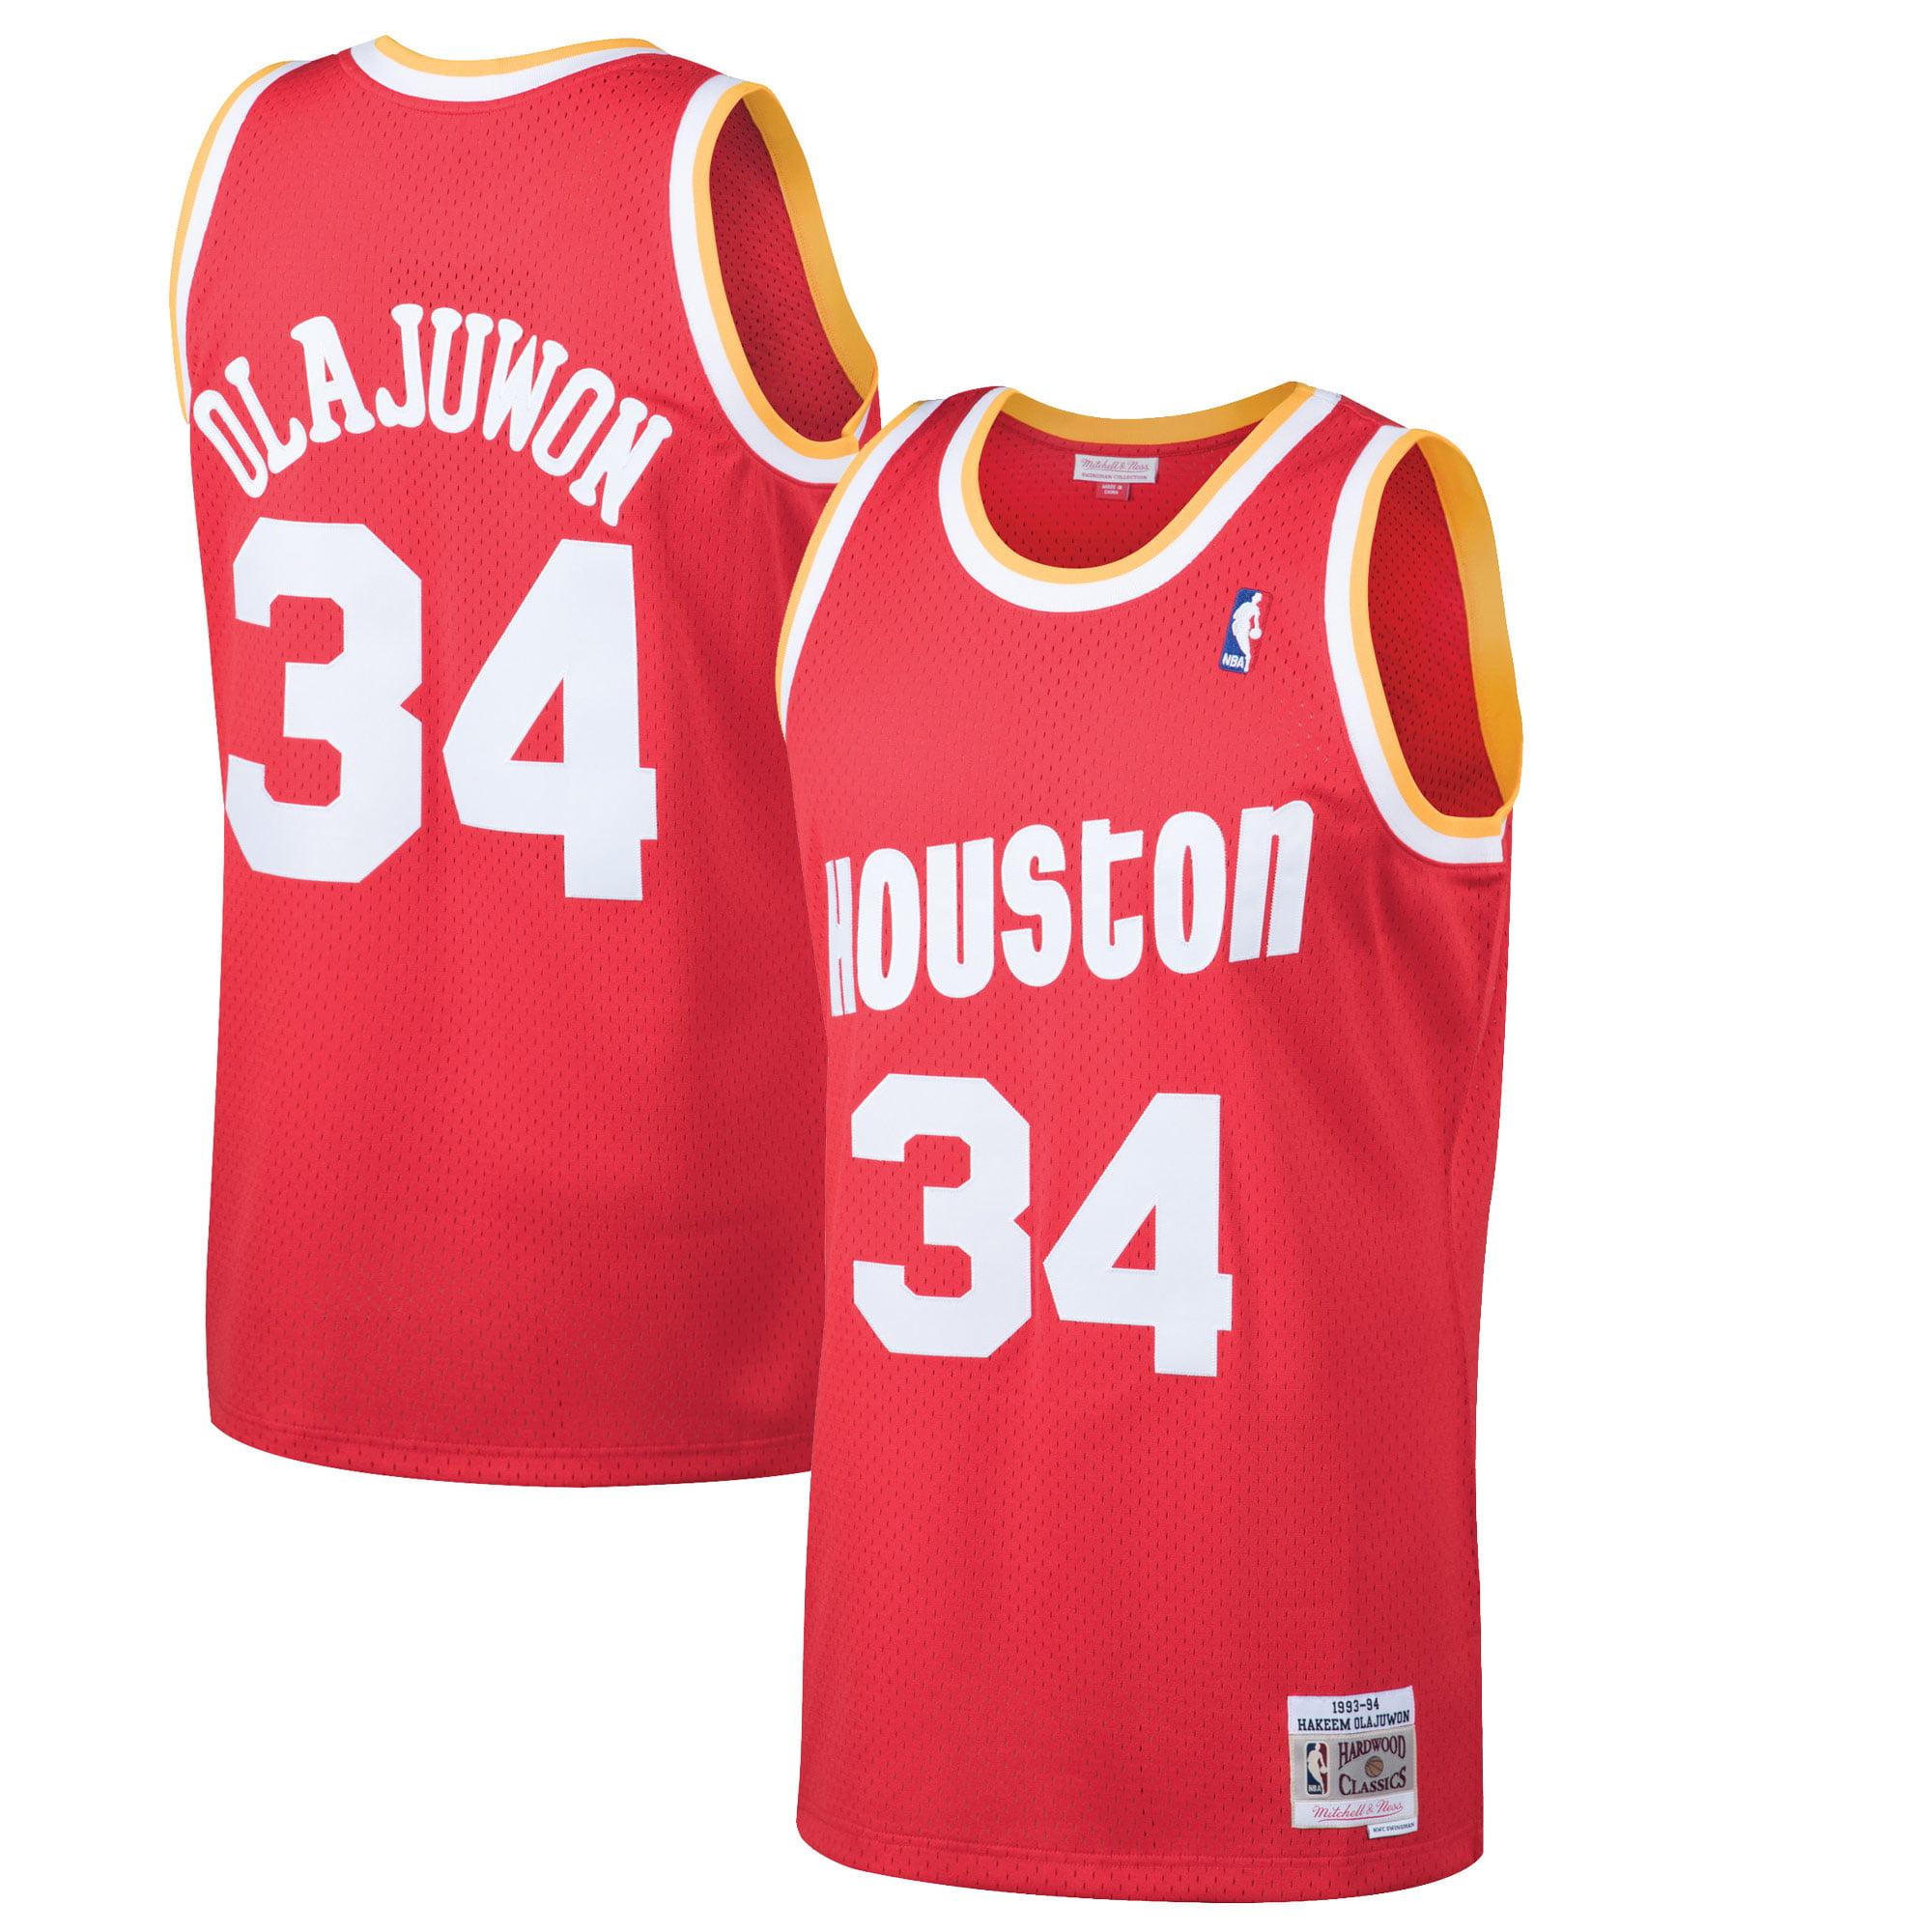 Hakeem Olajuwon Houston Rockets Mitchell & Ness 1993-94 Hardwood Classics Swingman Jersey - Red